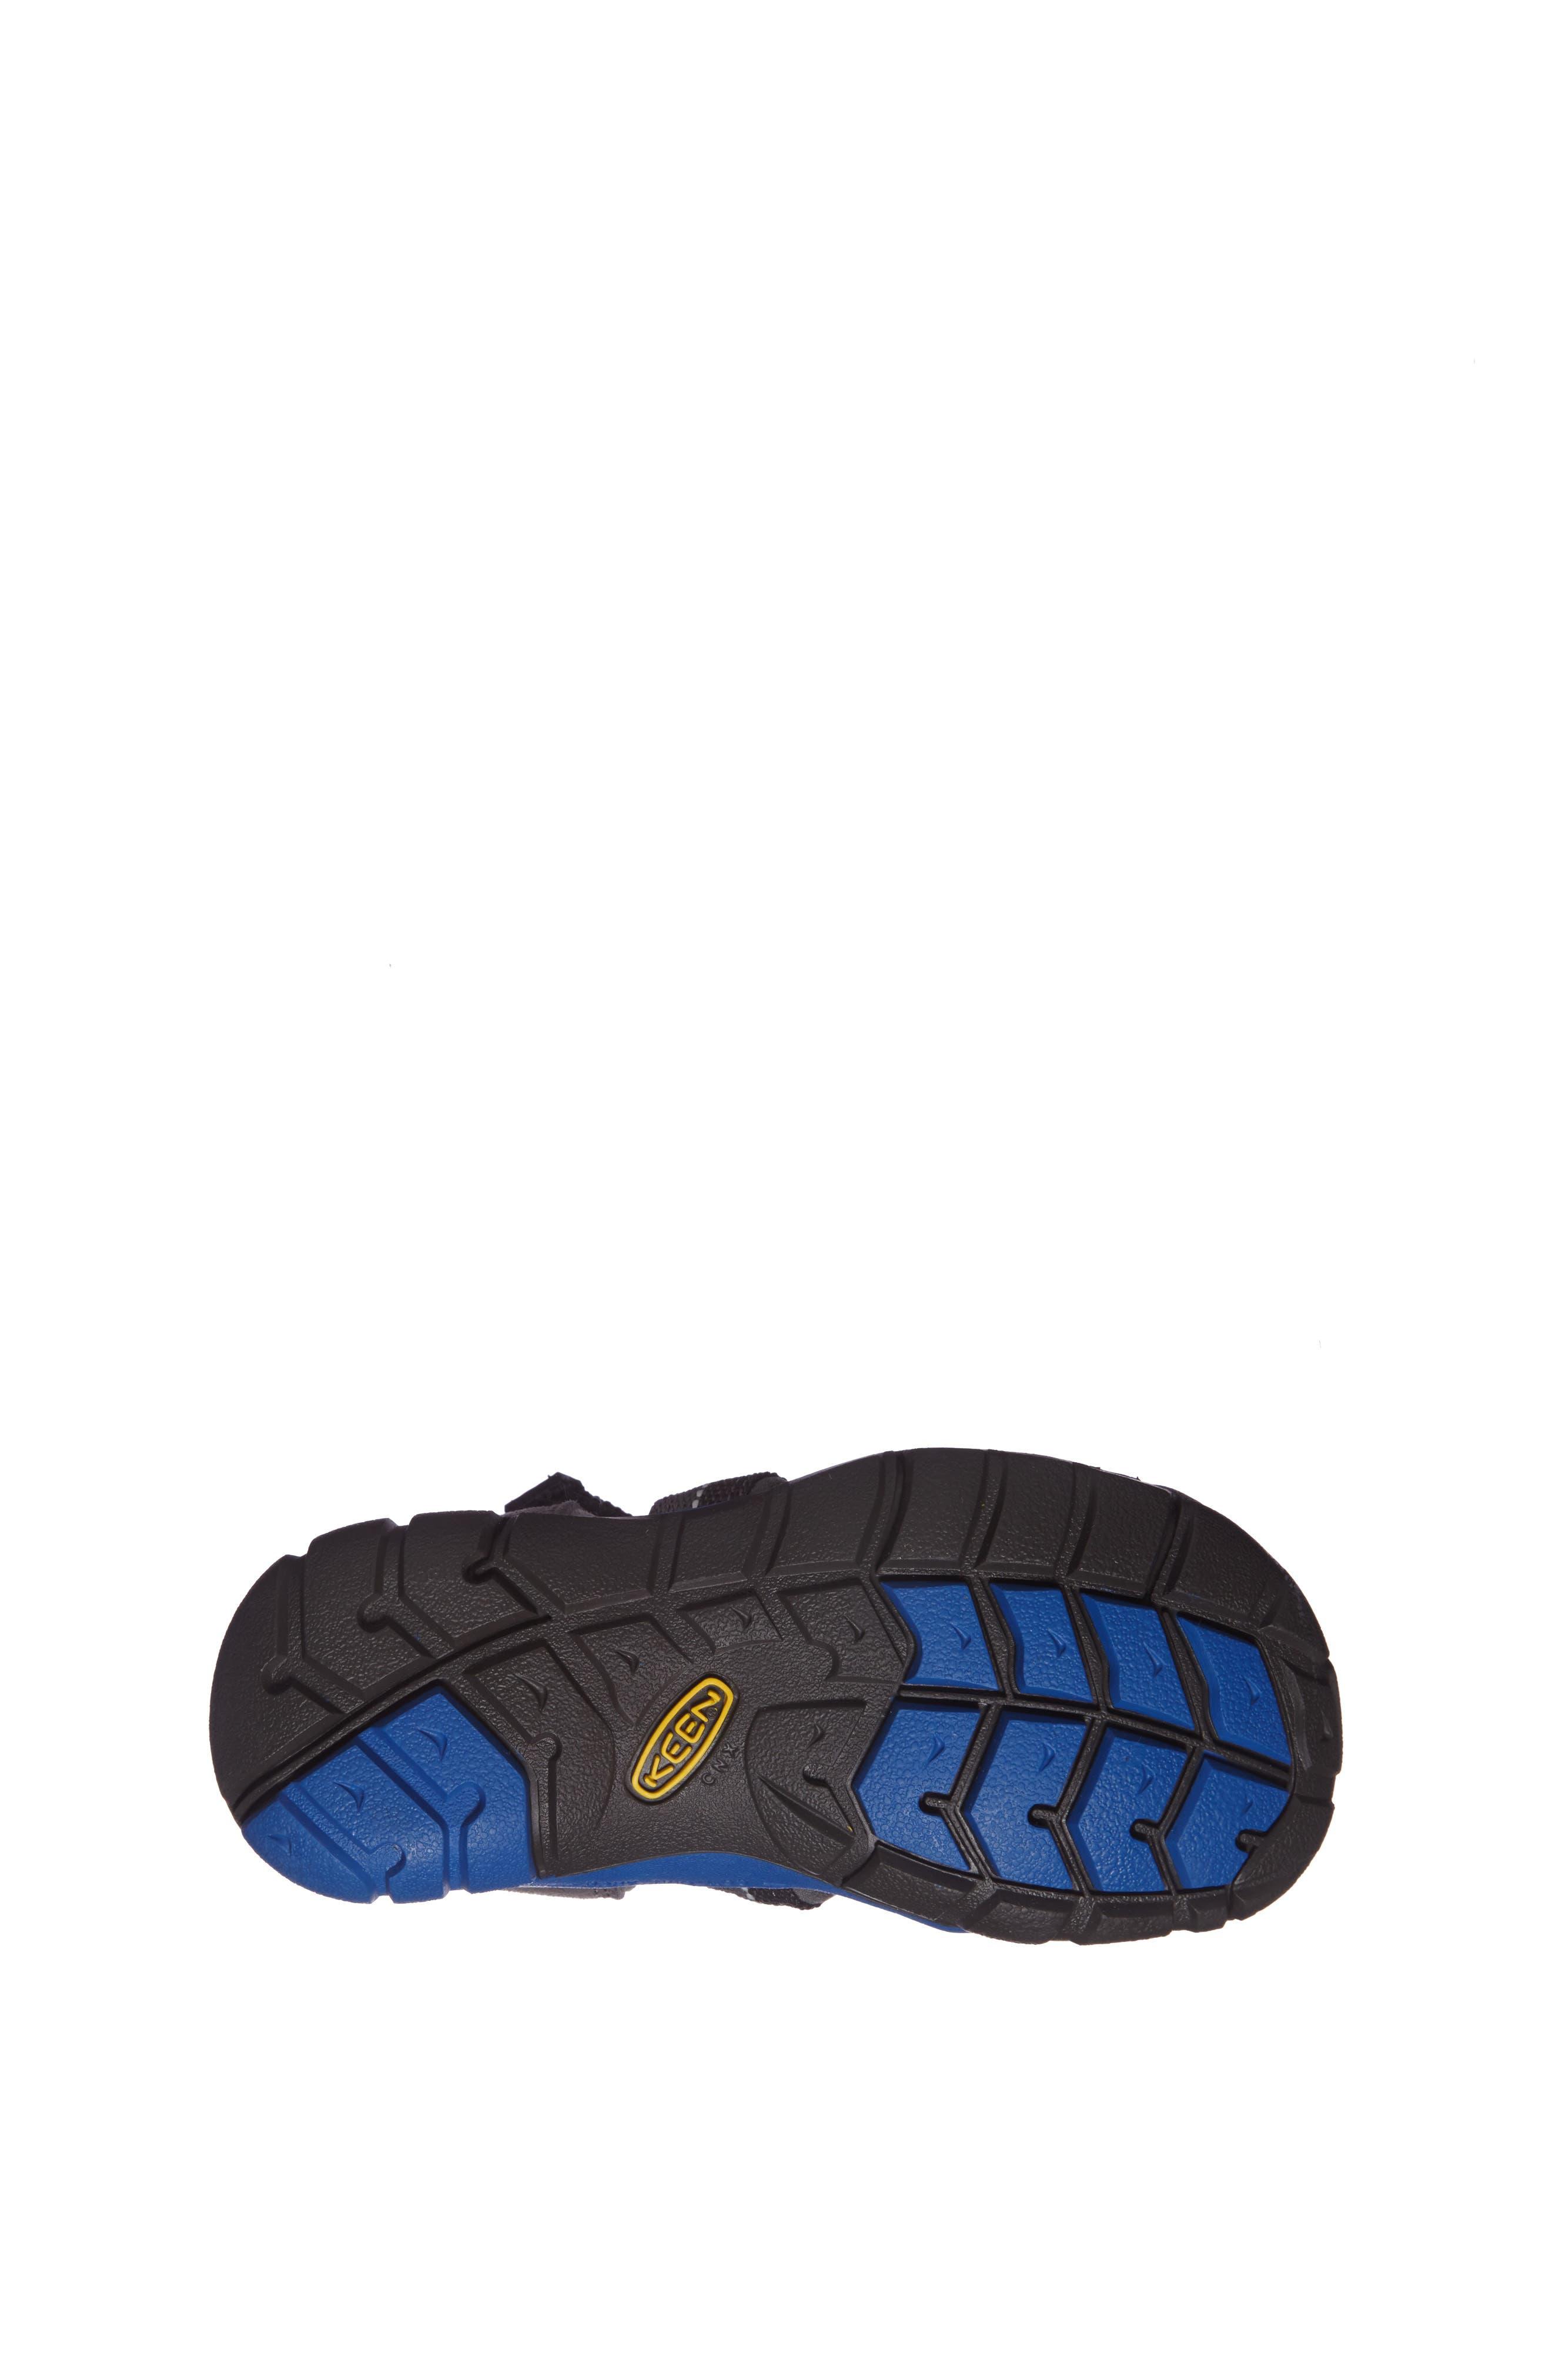 ,                             'Seacamp II' Water Friendly Sandal,                             Alternate thumbnail 113, color,                             020